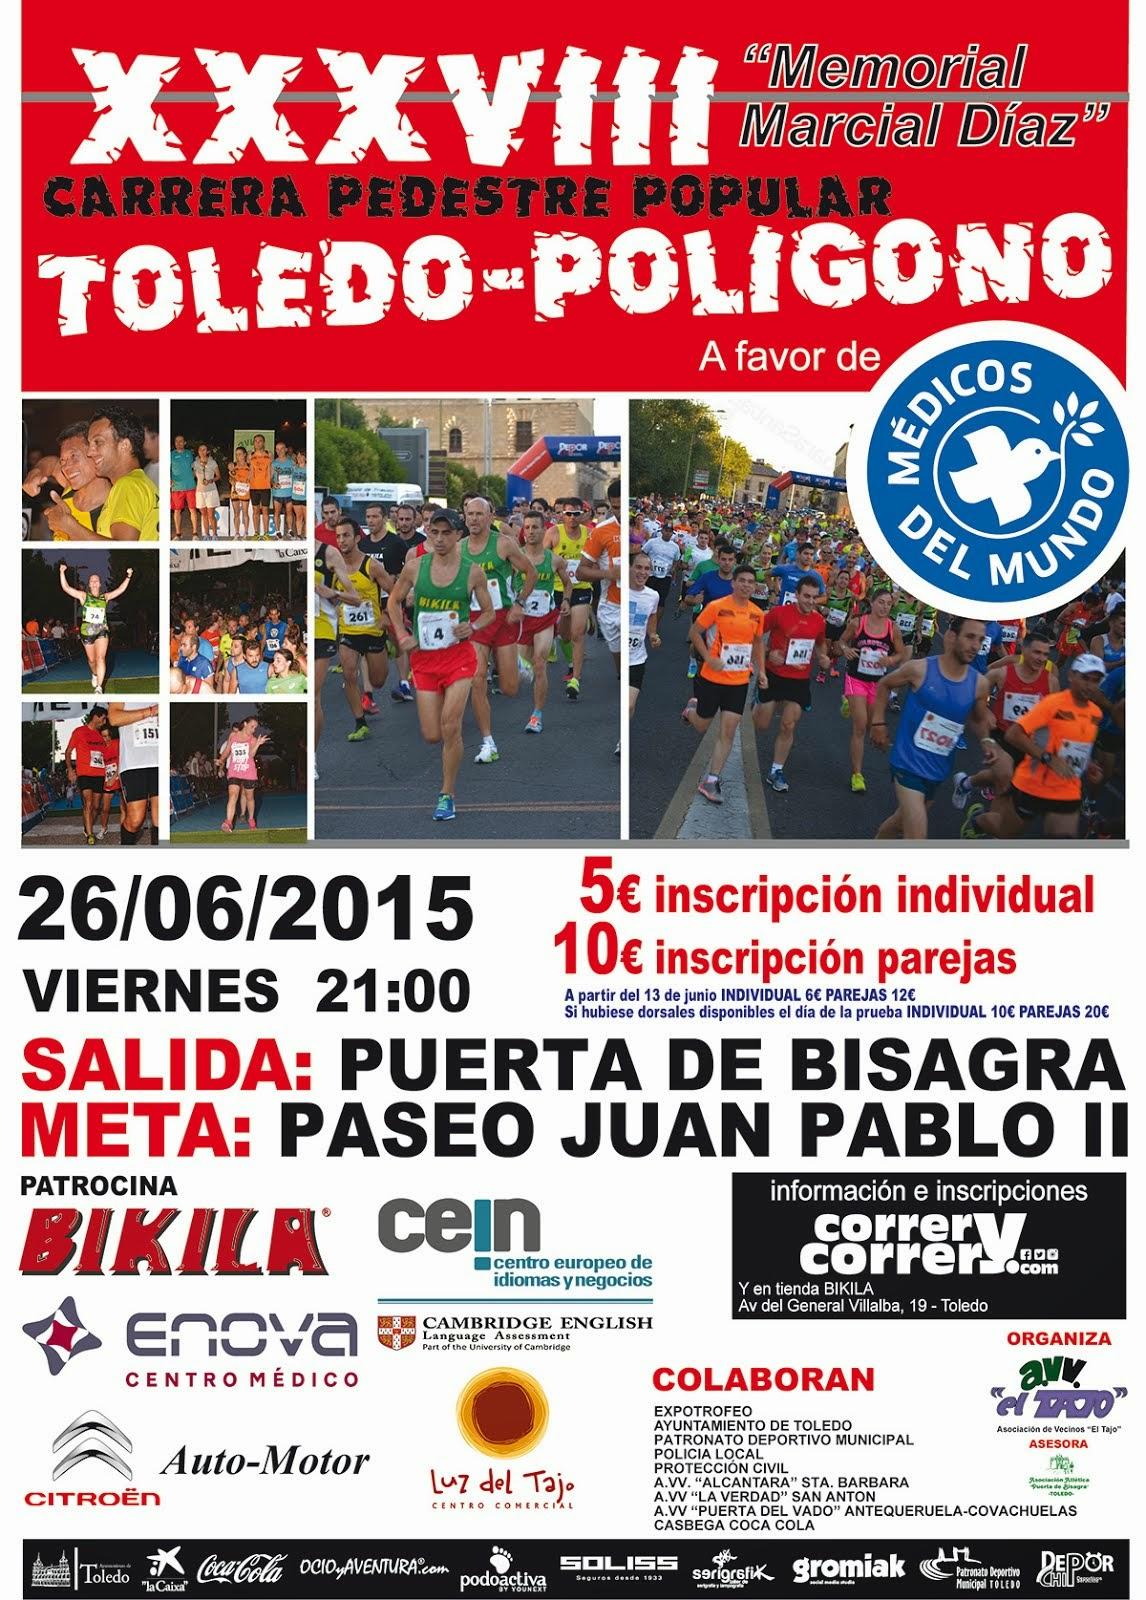 XXXVIII Carrera Popular Toledo-Polígono